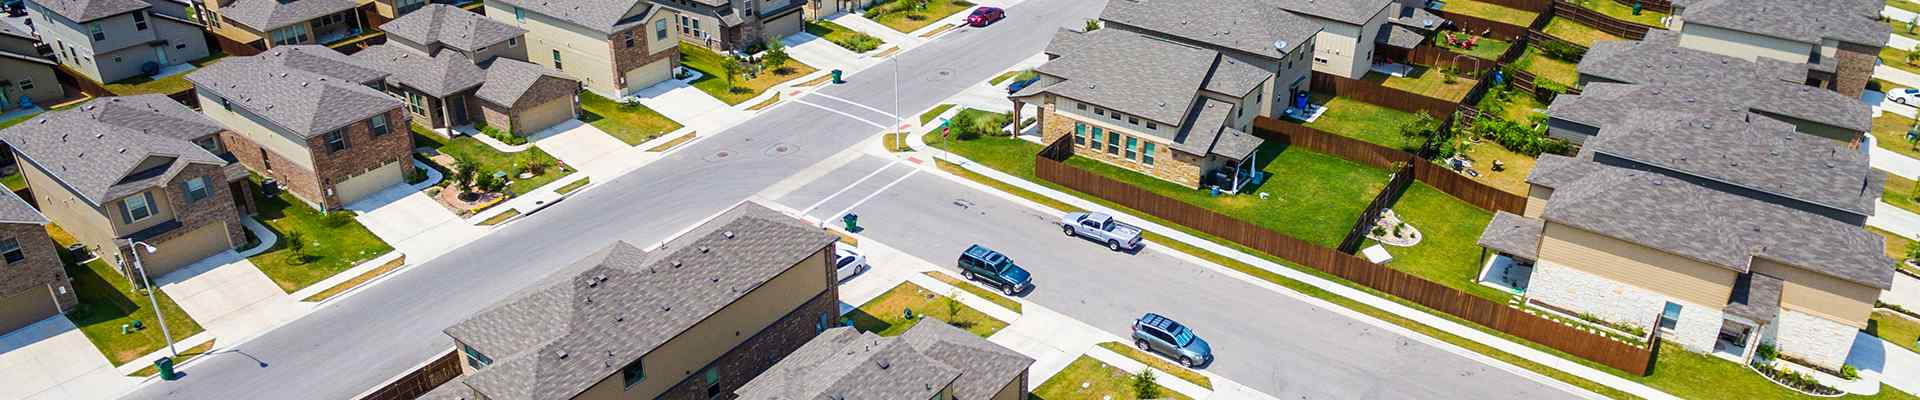 a suburban neighborhood in trophy club texas